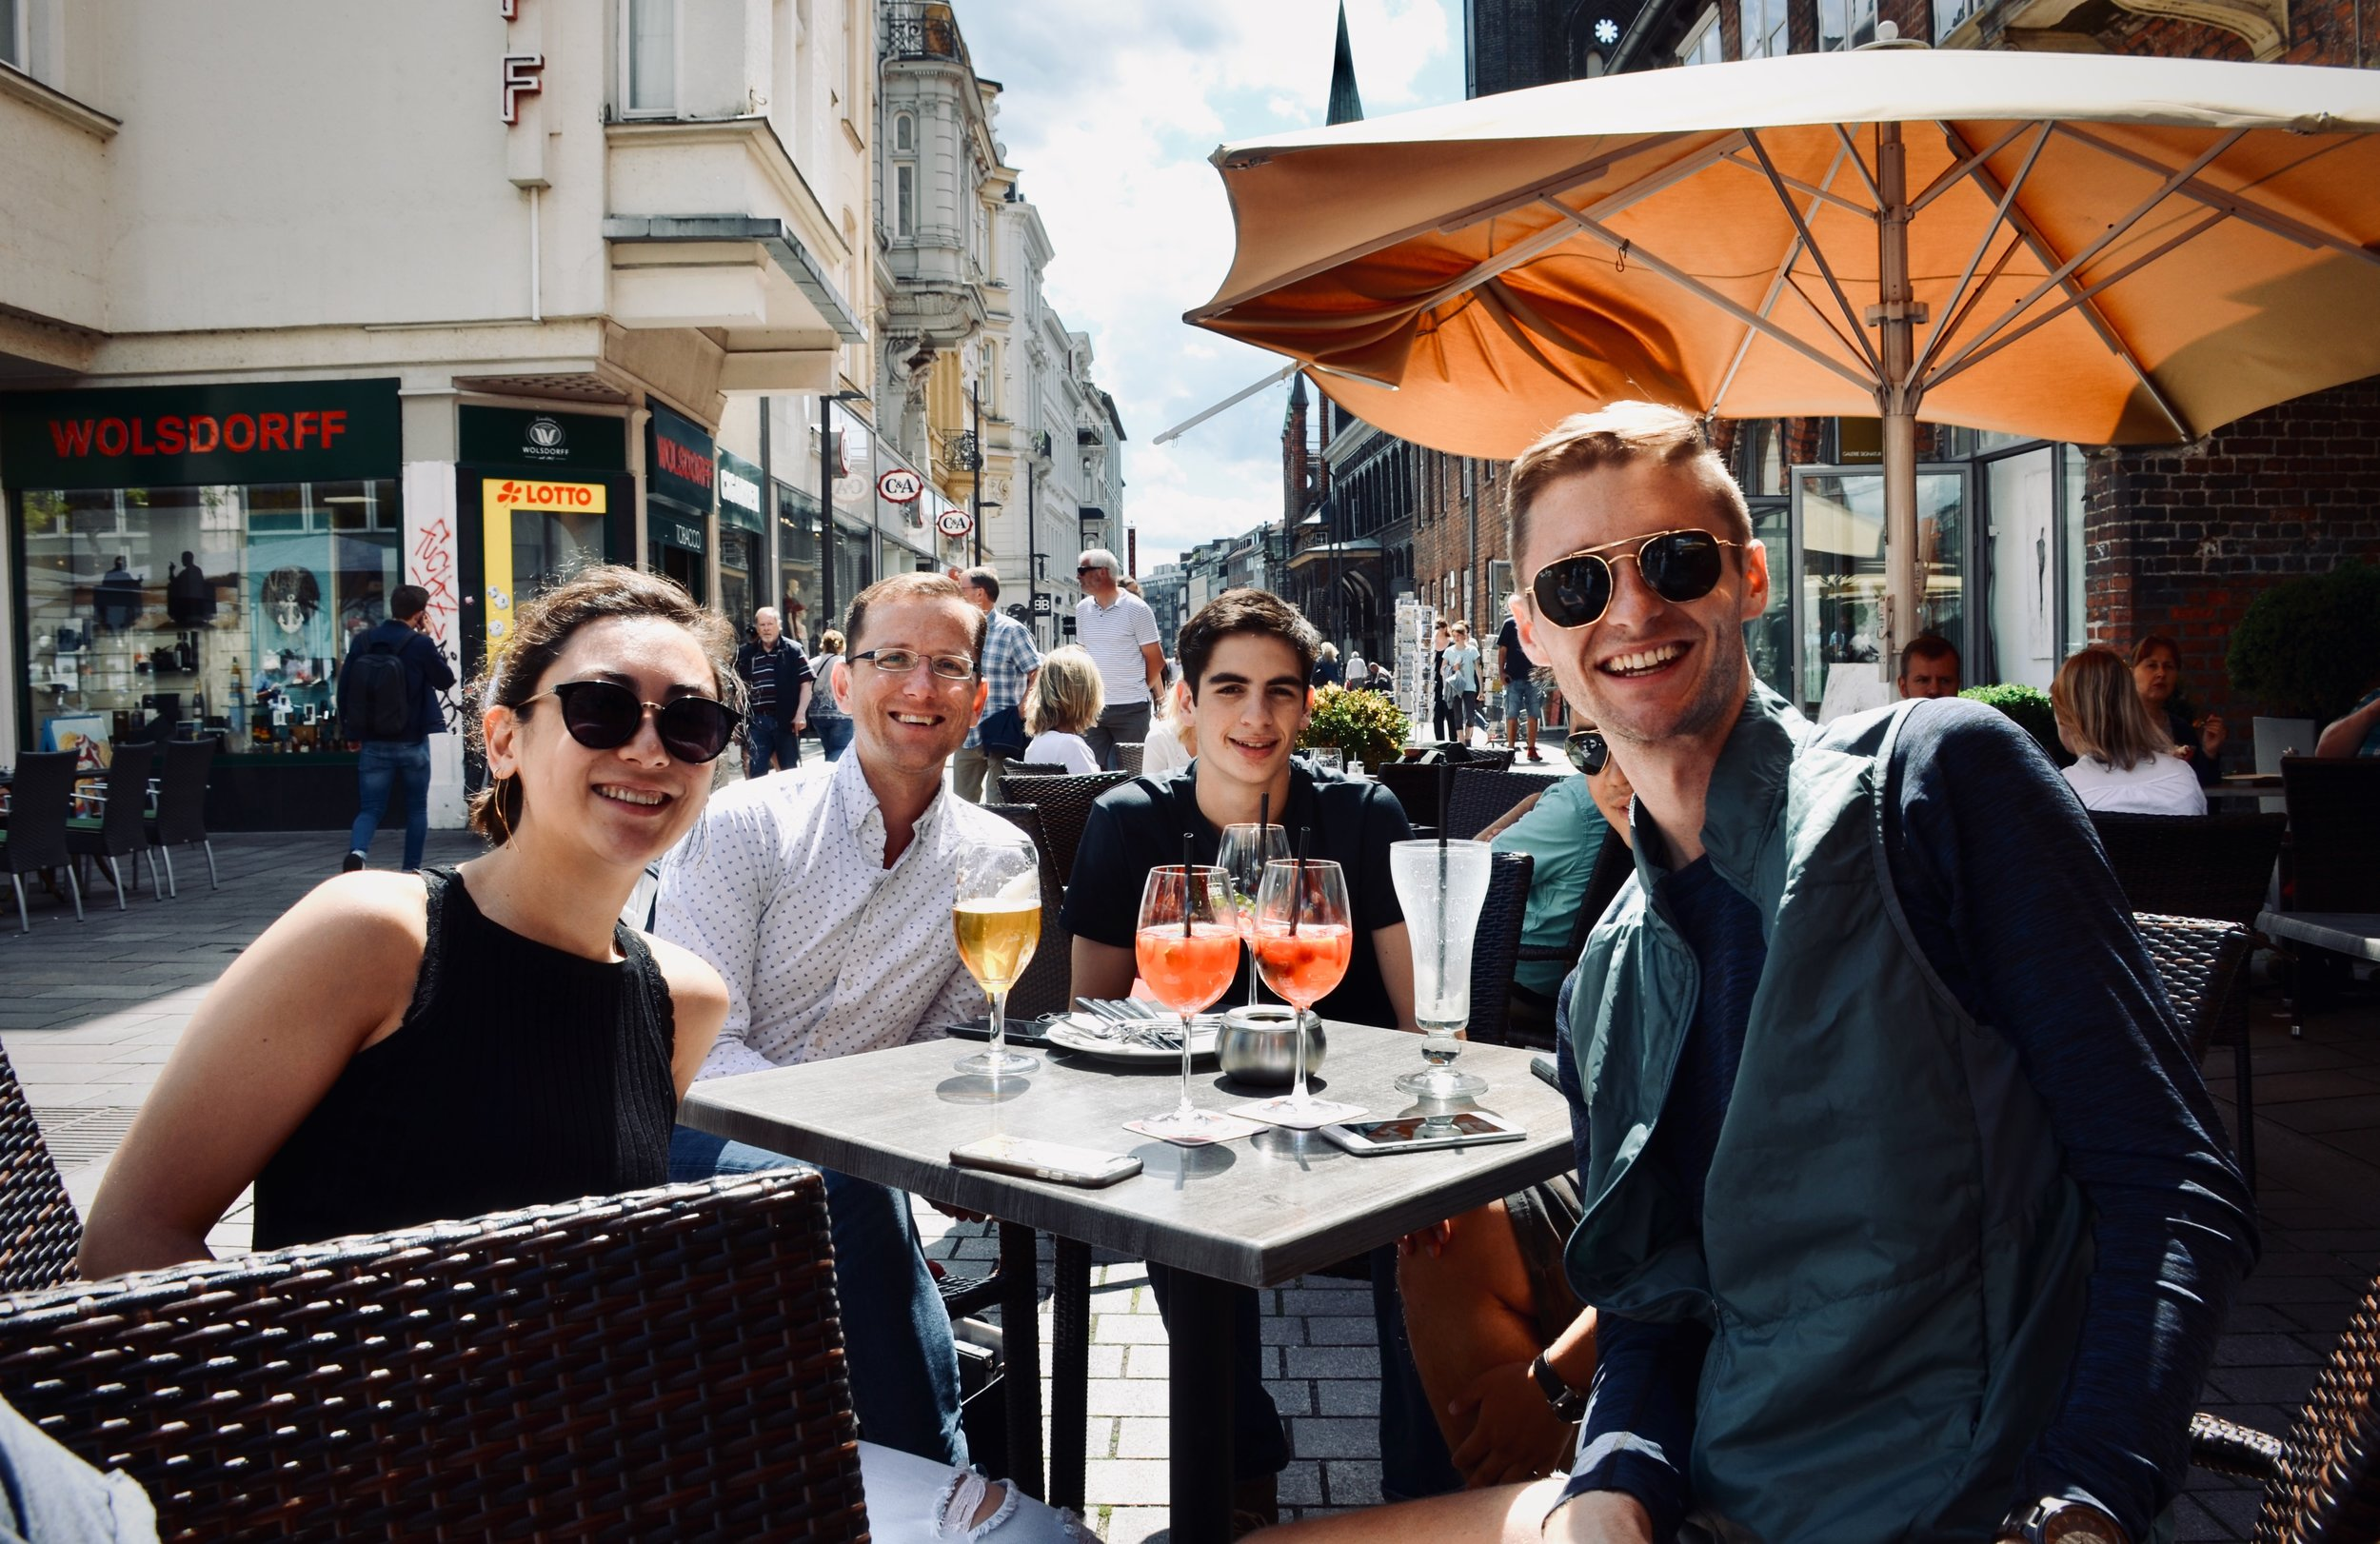 Meg Cutting, Christian Lane, Alex Marin, and Evan Currie enjoys lunch in Lübeck.